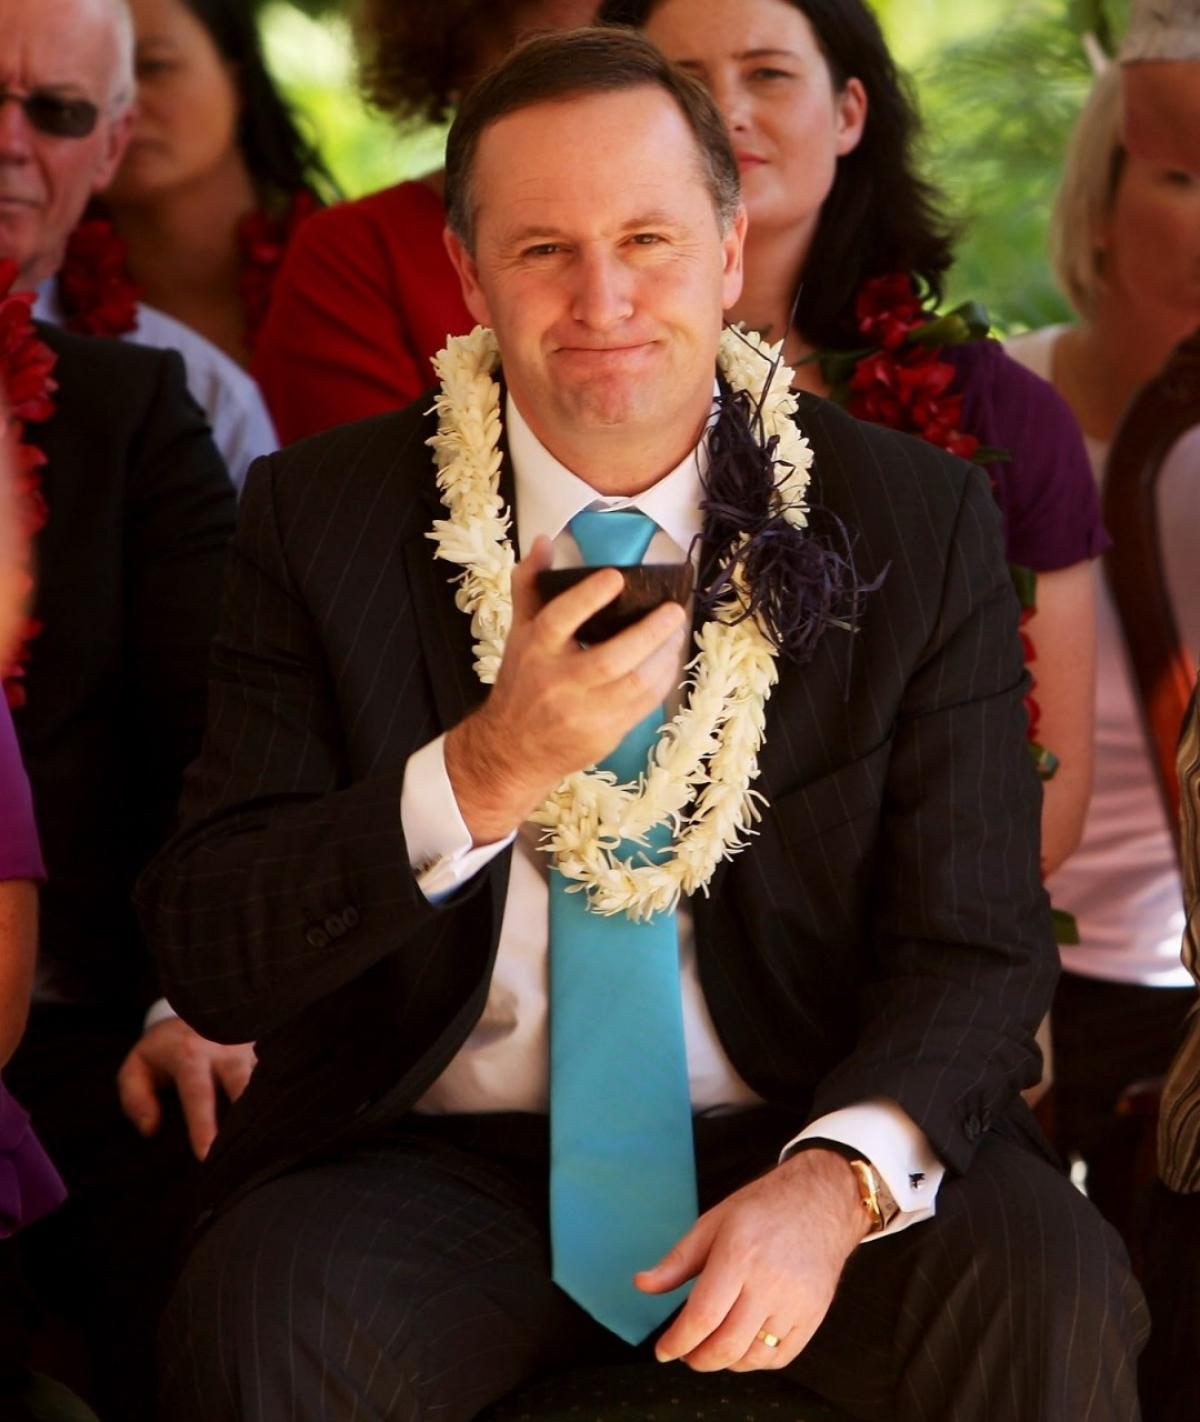 John Key after a shell of kava in Samoa